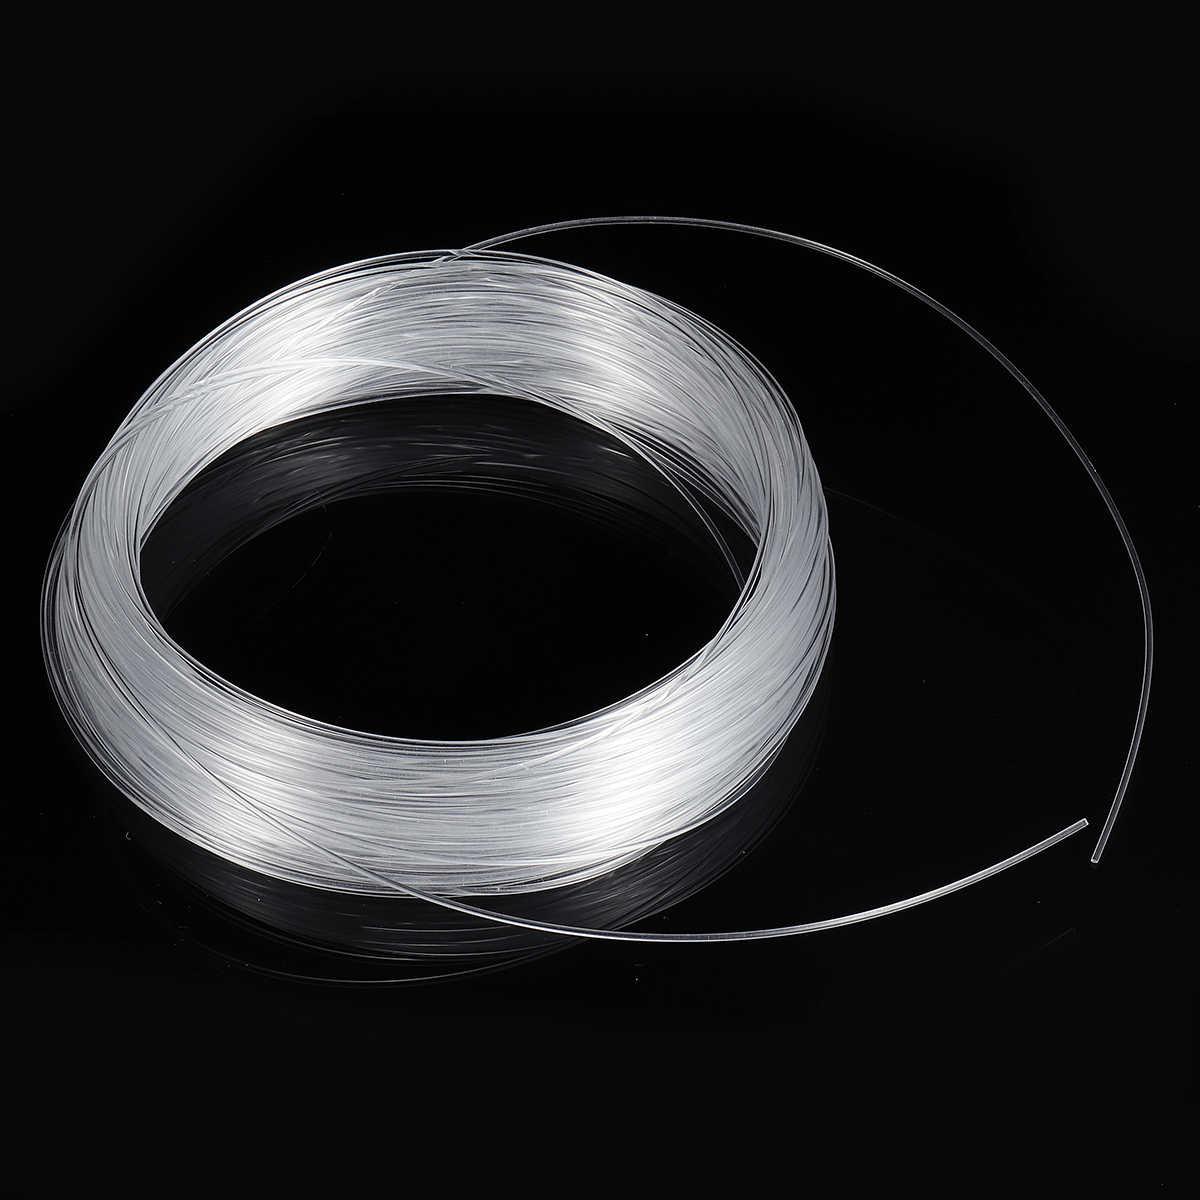 clear pmma optic cable fiber light 50m 164ft end grow led light guide kit diy  [ 1200 x 1200 Pixel ]